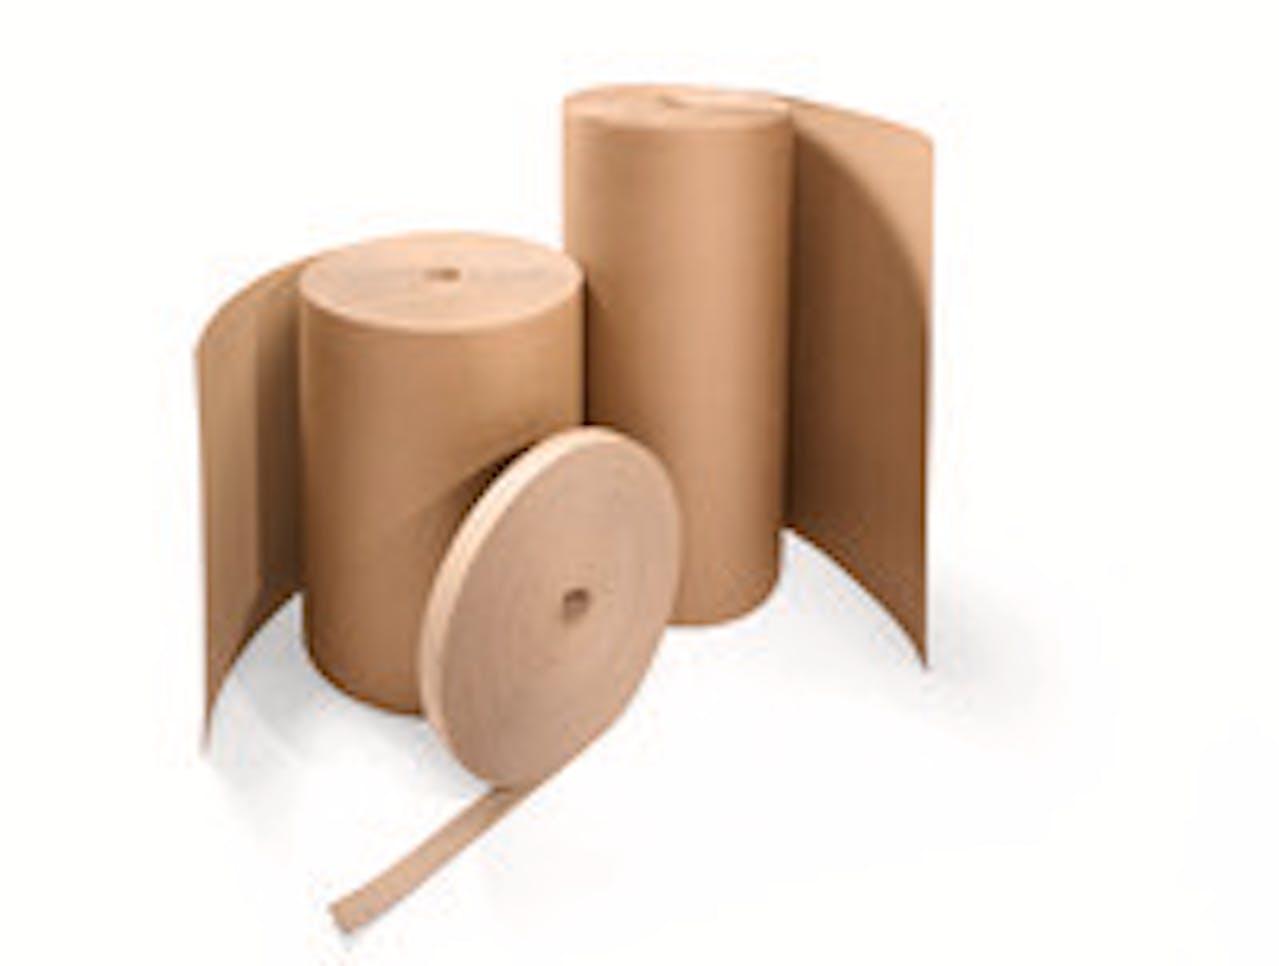 Polster-Pappe Flexipack auf der Rolle